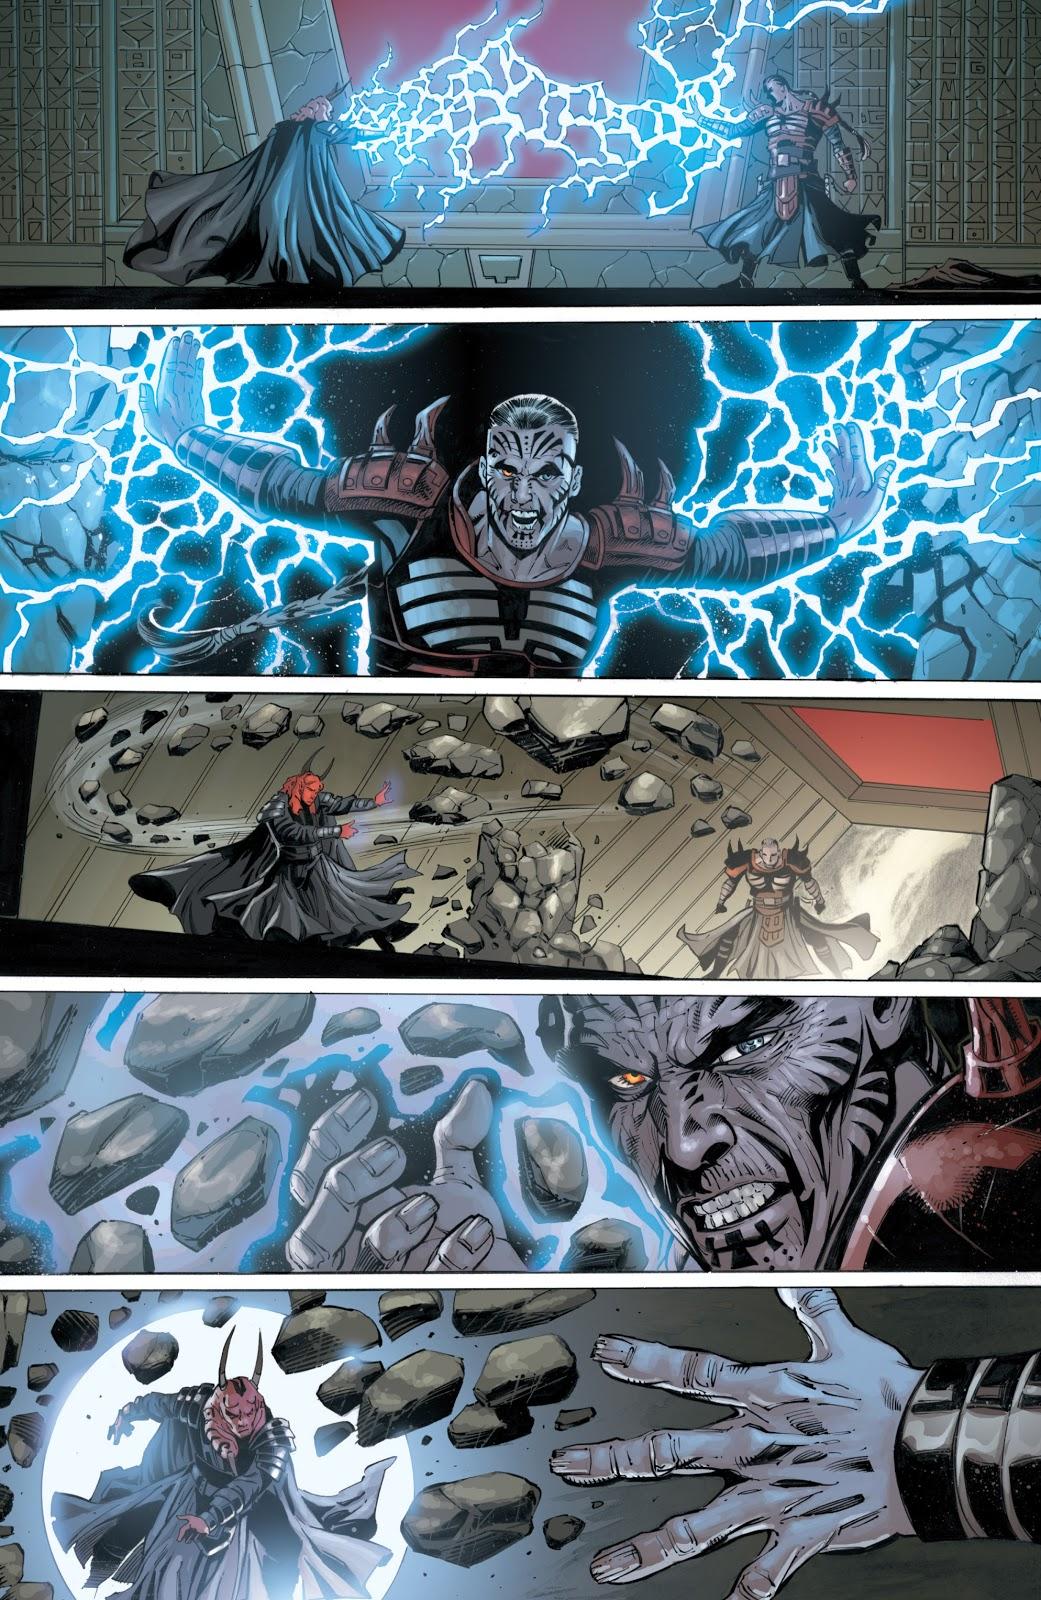 SS - Ajunta Pall (Cheth) vs Cade Skywalker (ArkhamAsylum3) - Page 2 Krayt_37